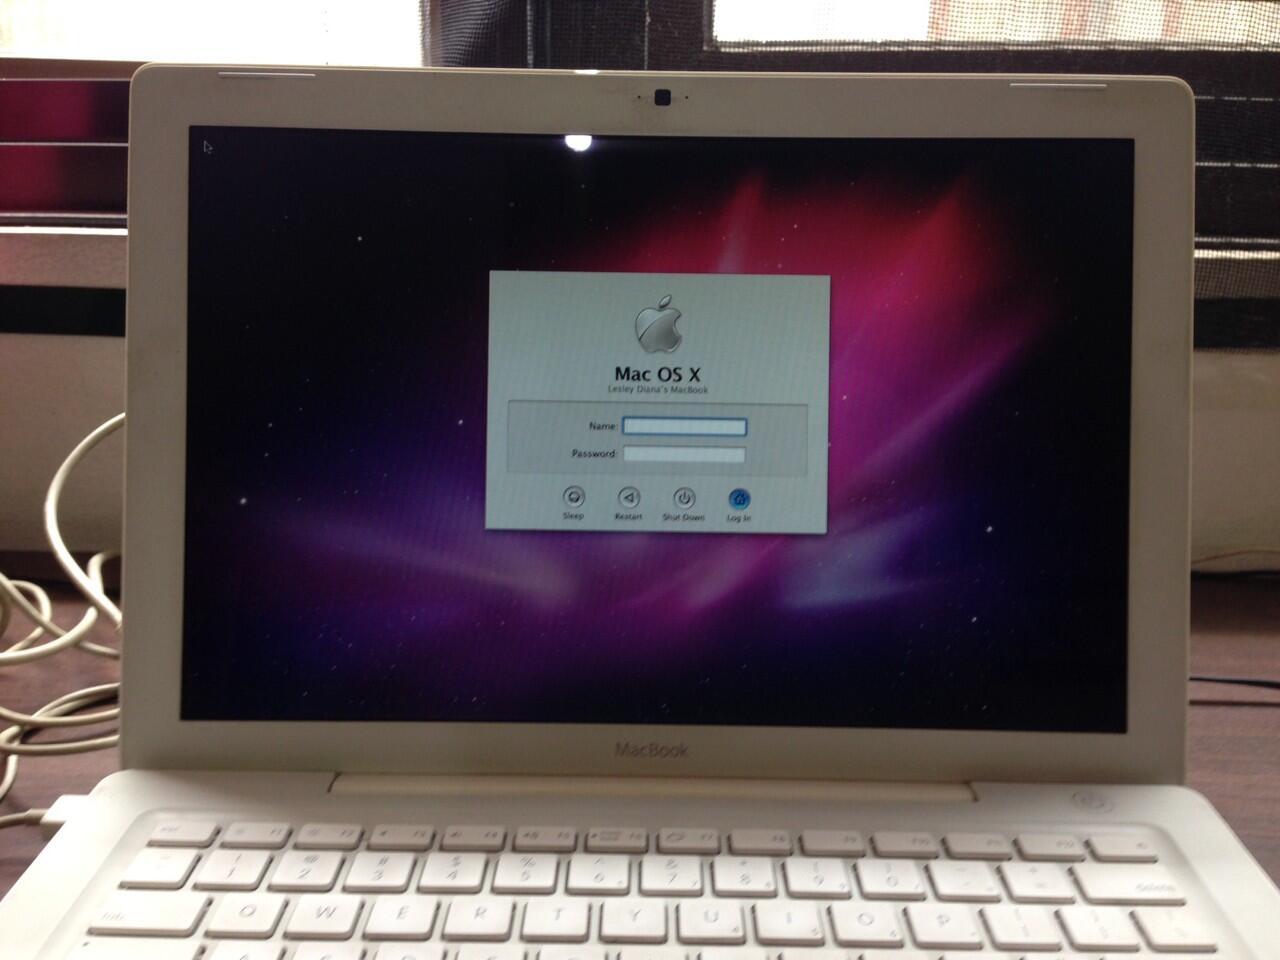 JUAL Macbook White 13 Inch